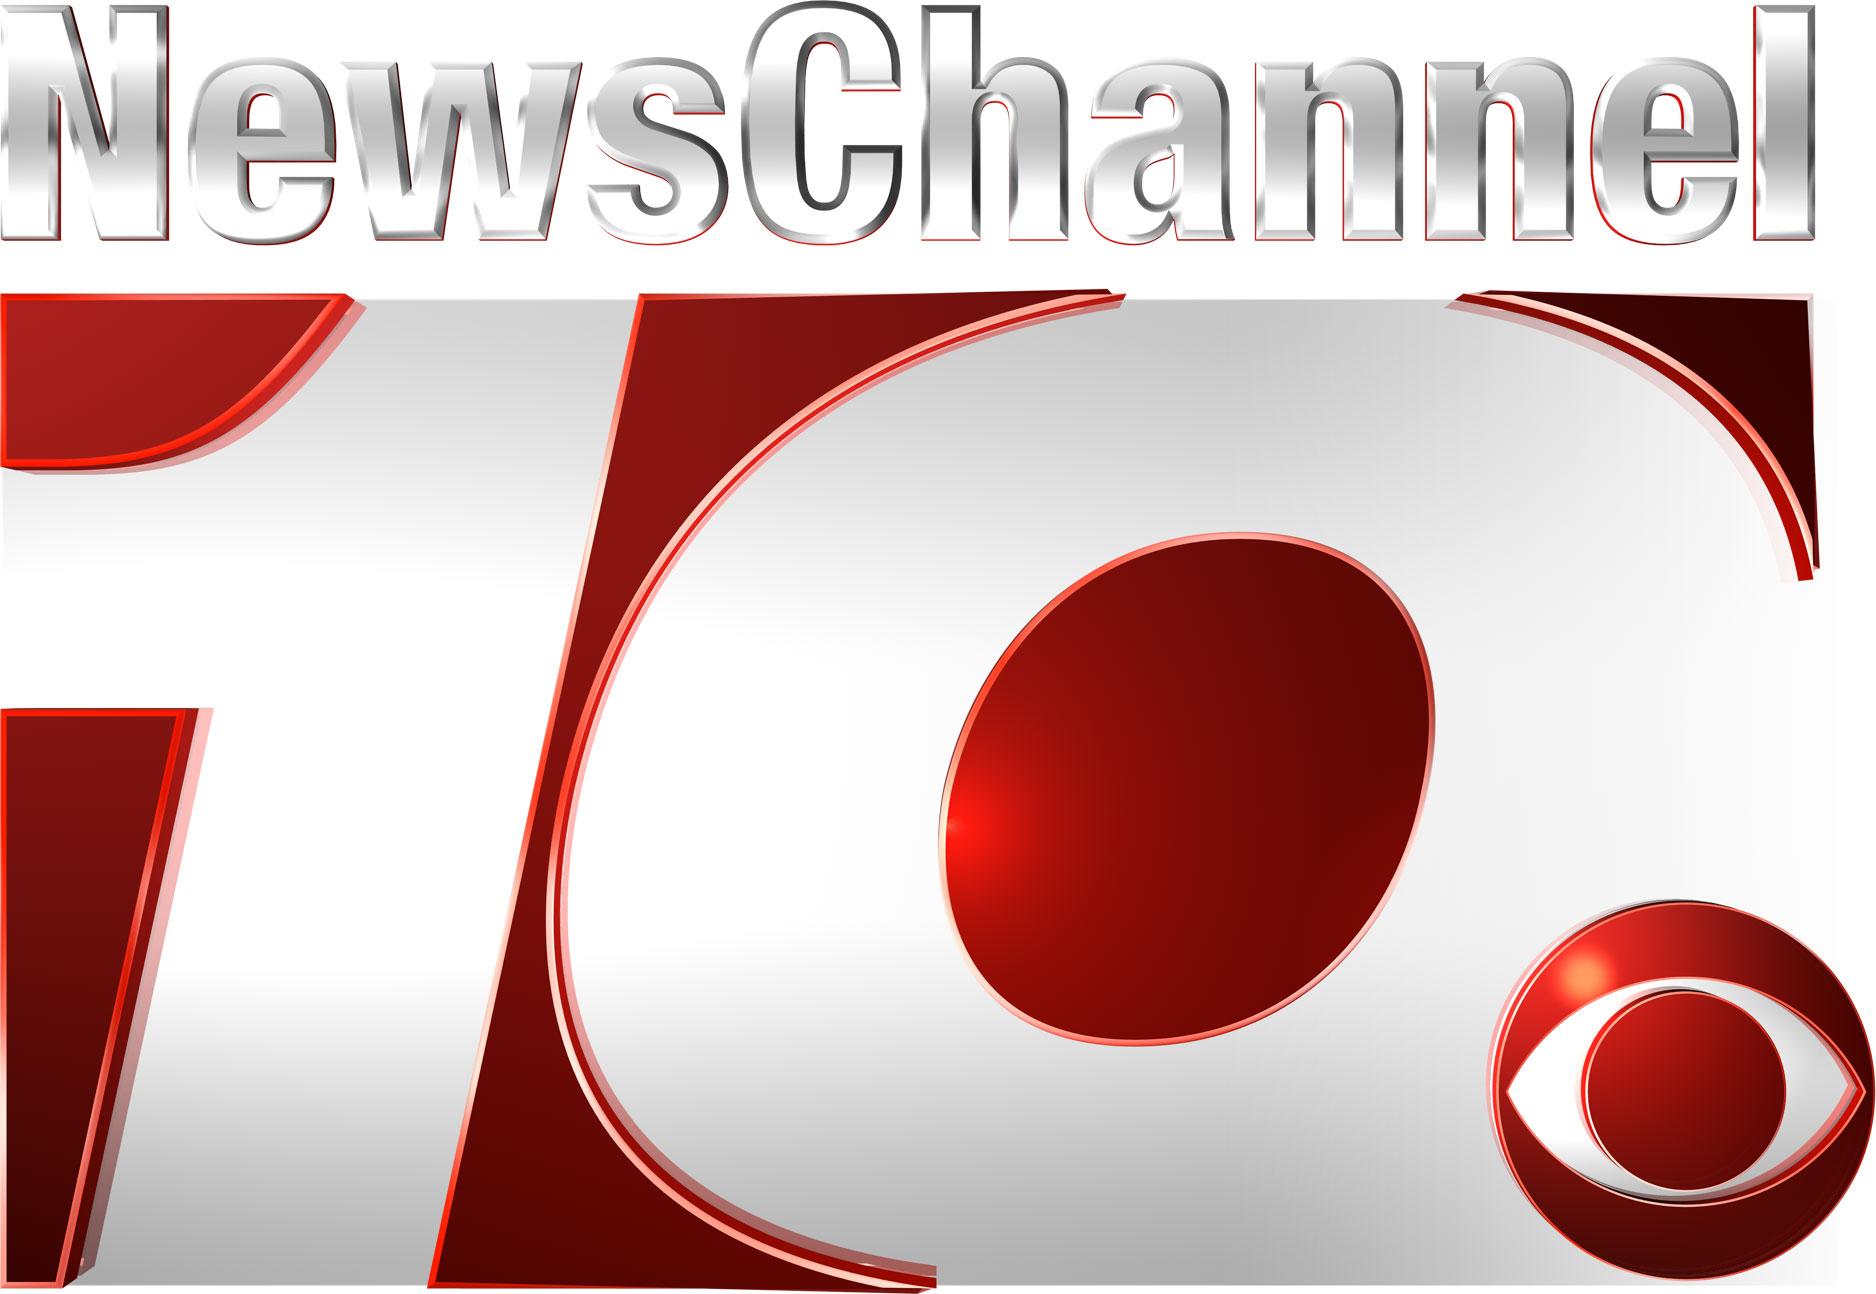 kfda-news-channel-10.jpg